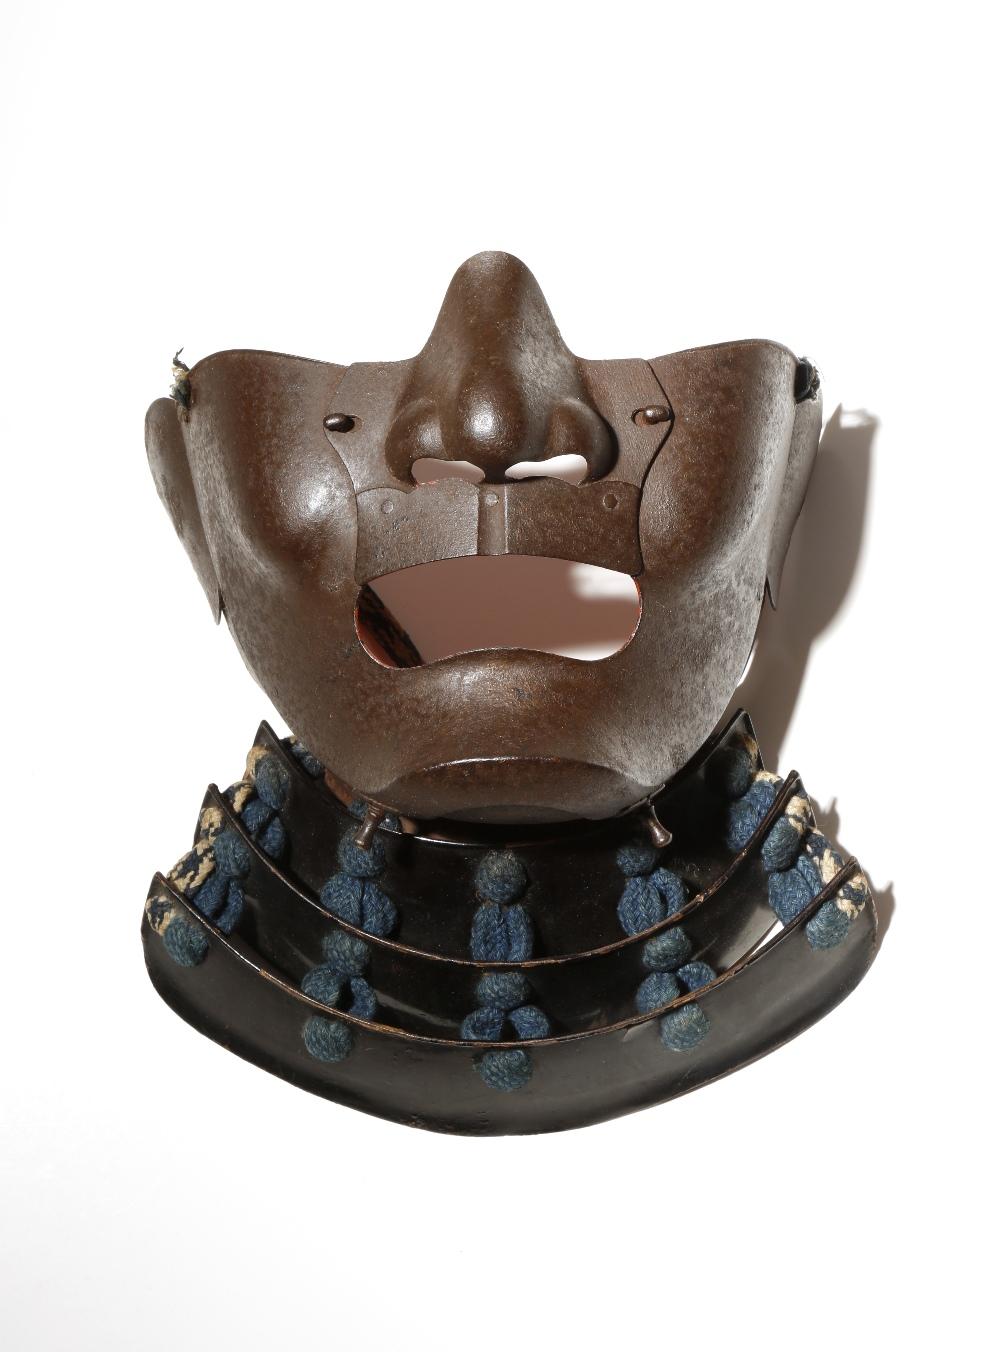 A JAPANESE IRON BIJO MEN MENPO EDO PERIOD, 19TH CENTURY The iron mask with elegant features in the